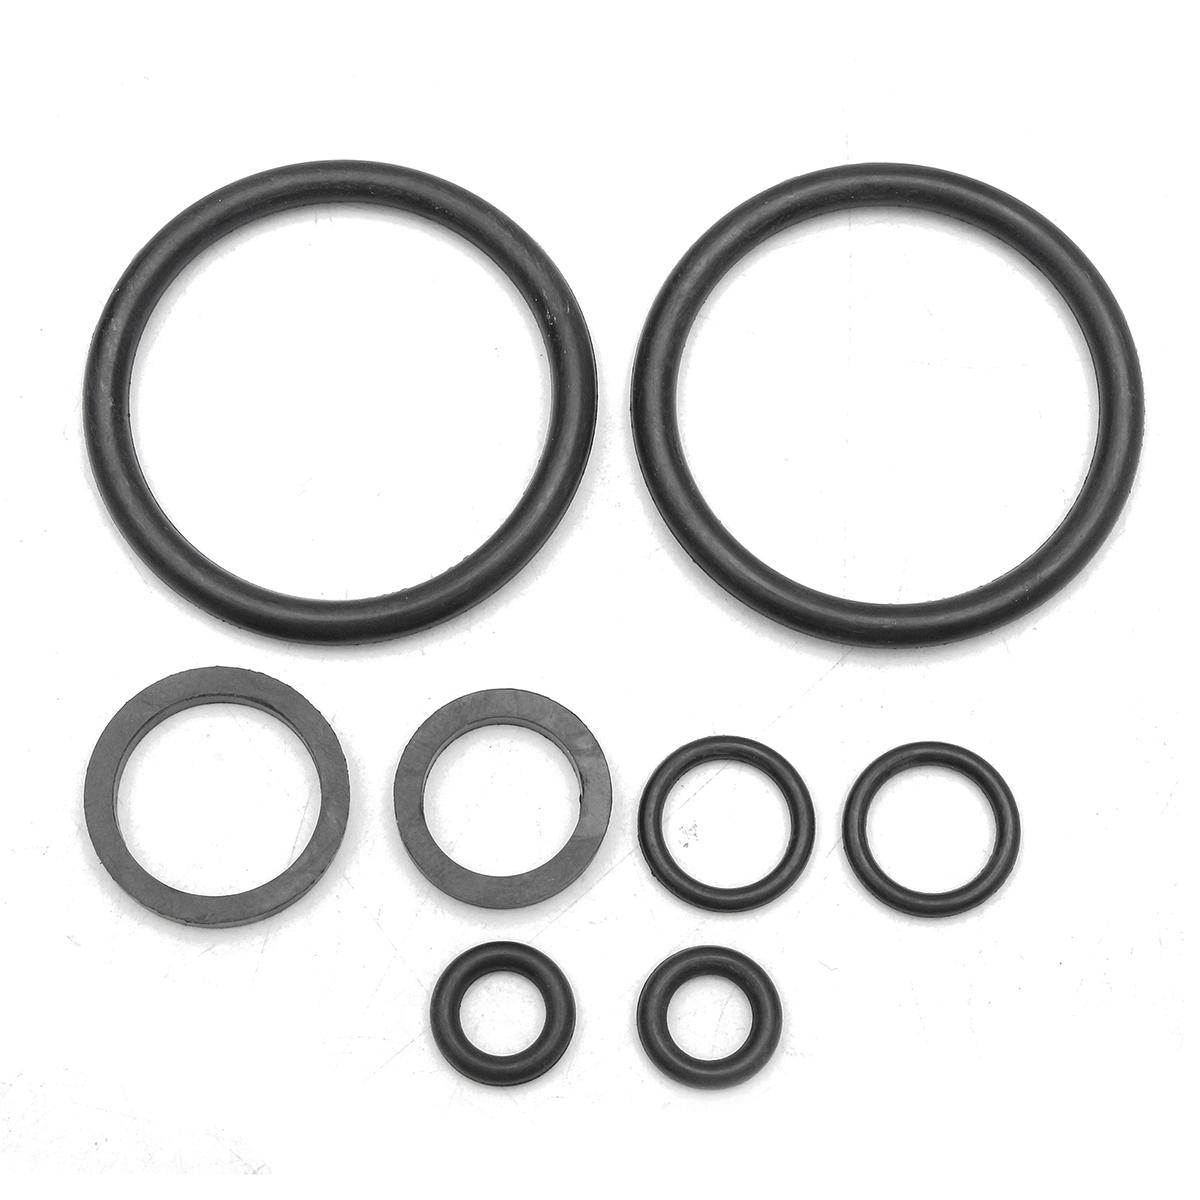 70cc Cylinder Piston Gasket Rings Motor Kit For ATV Honda